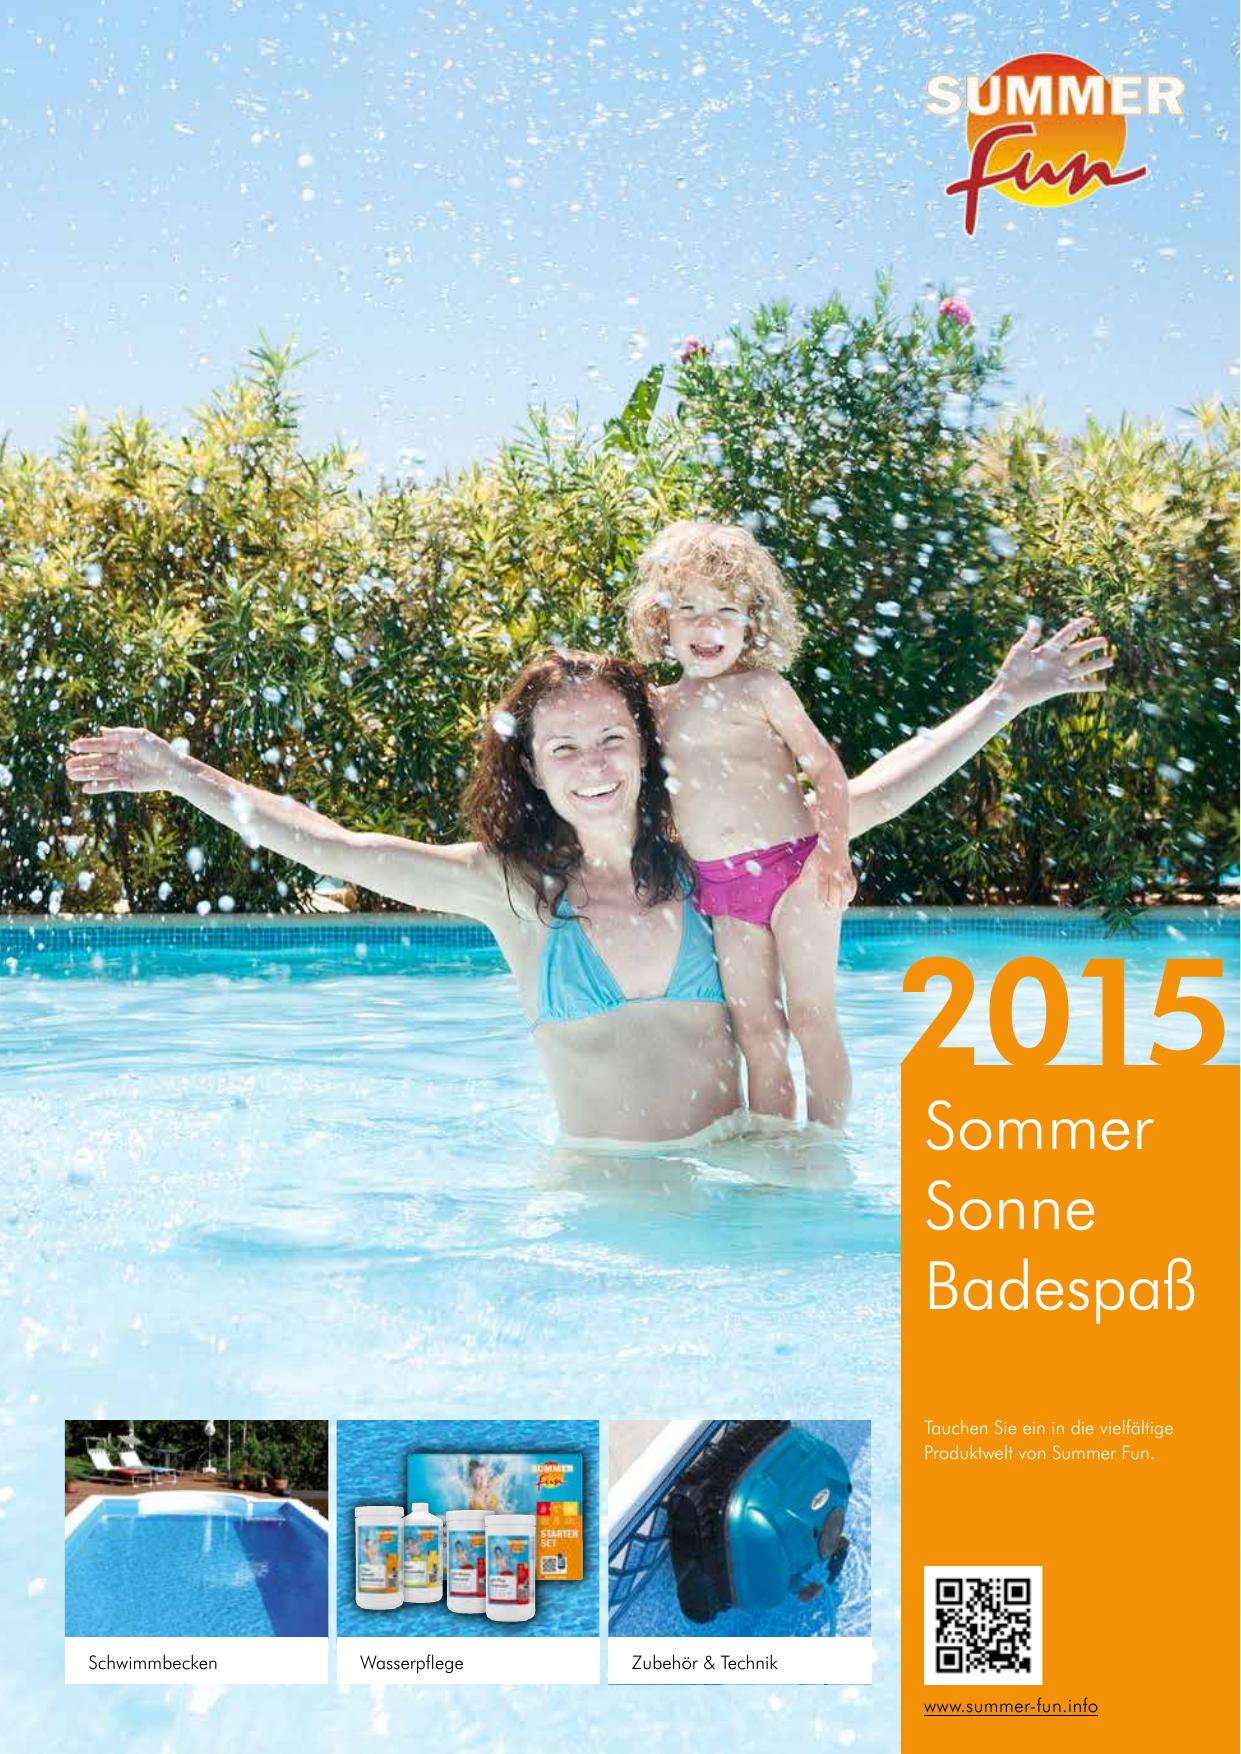 Filterkartusche Hochleistungsfilterkartusche Summer Fun Wülfing /& Hauck Pool